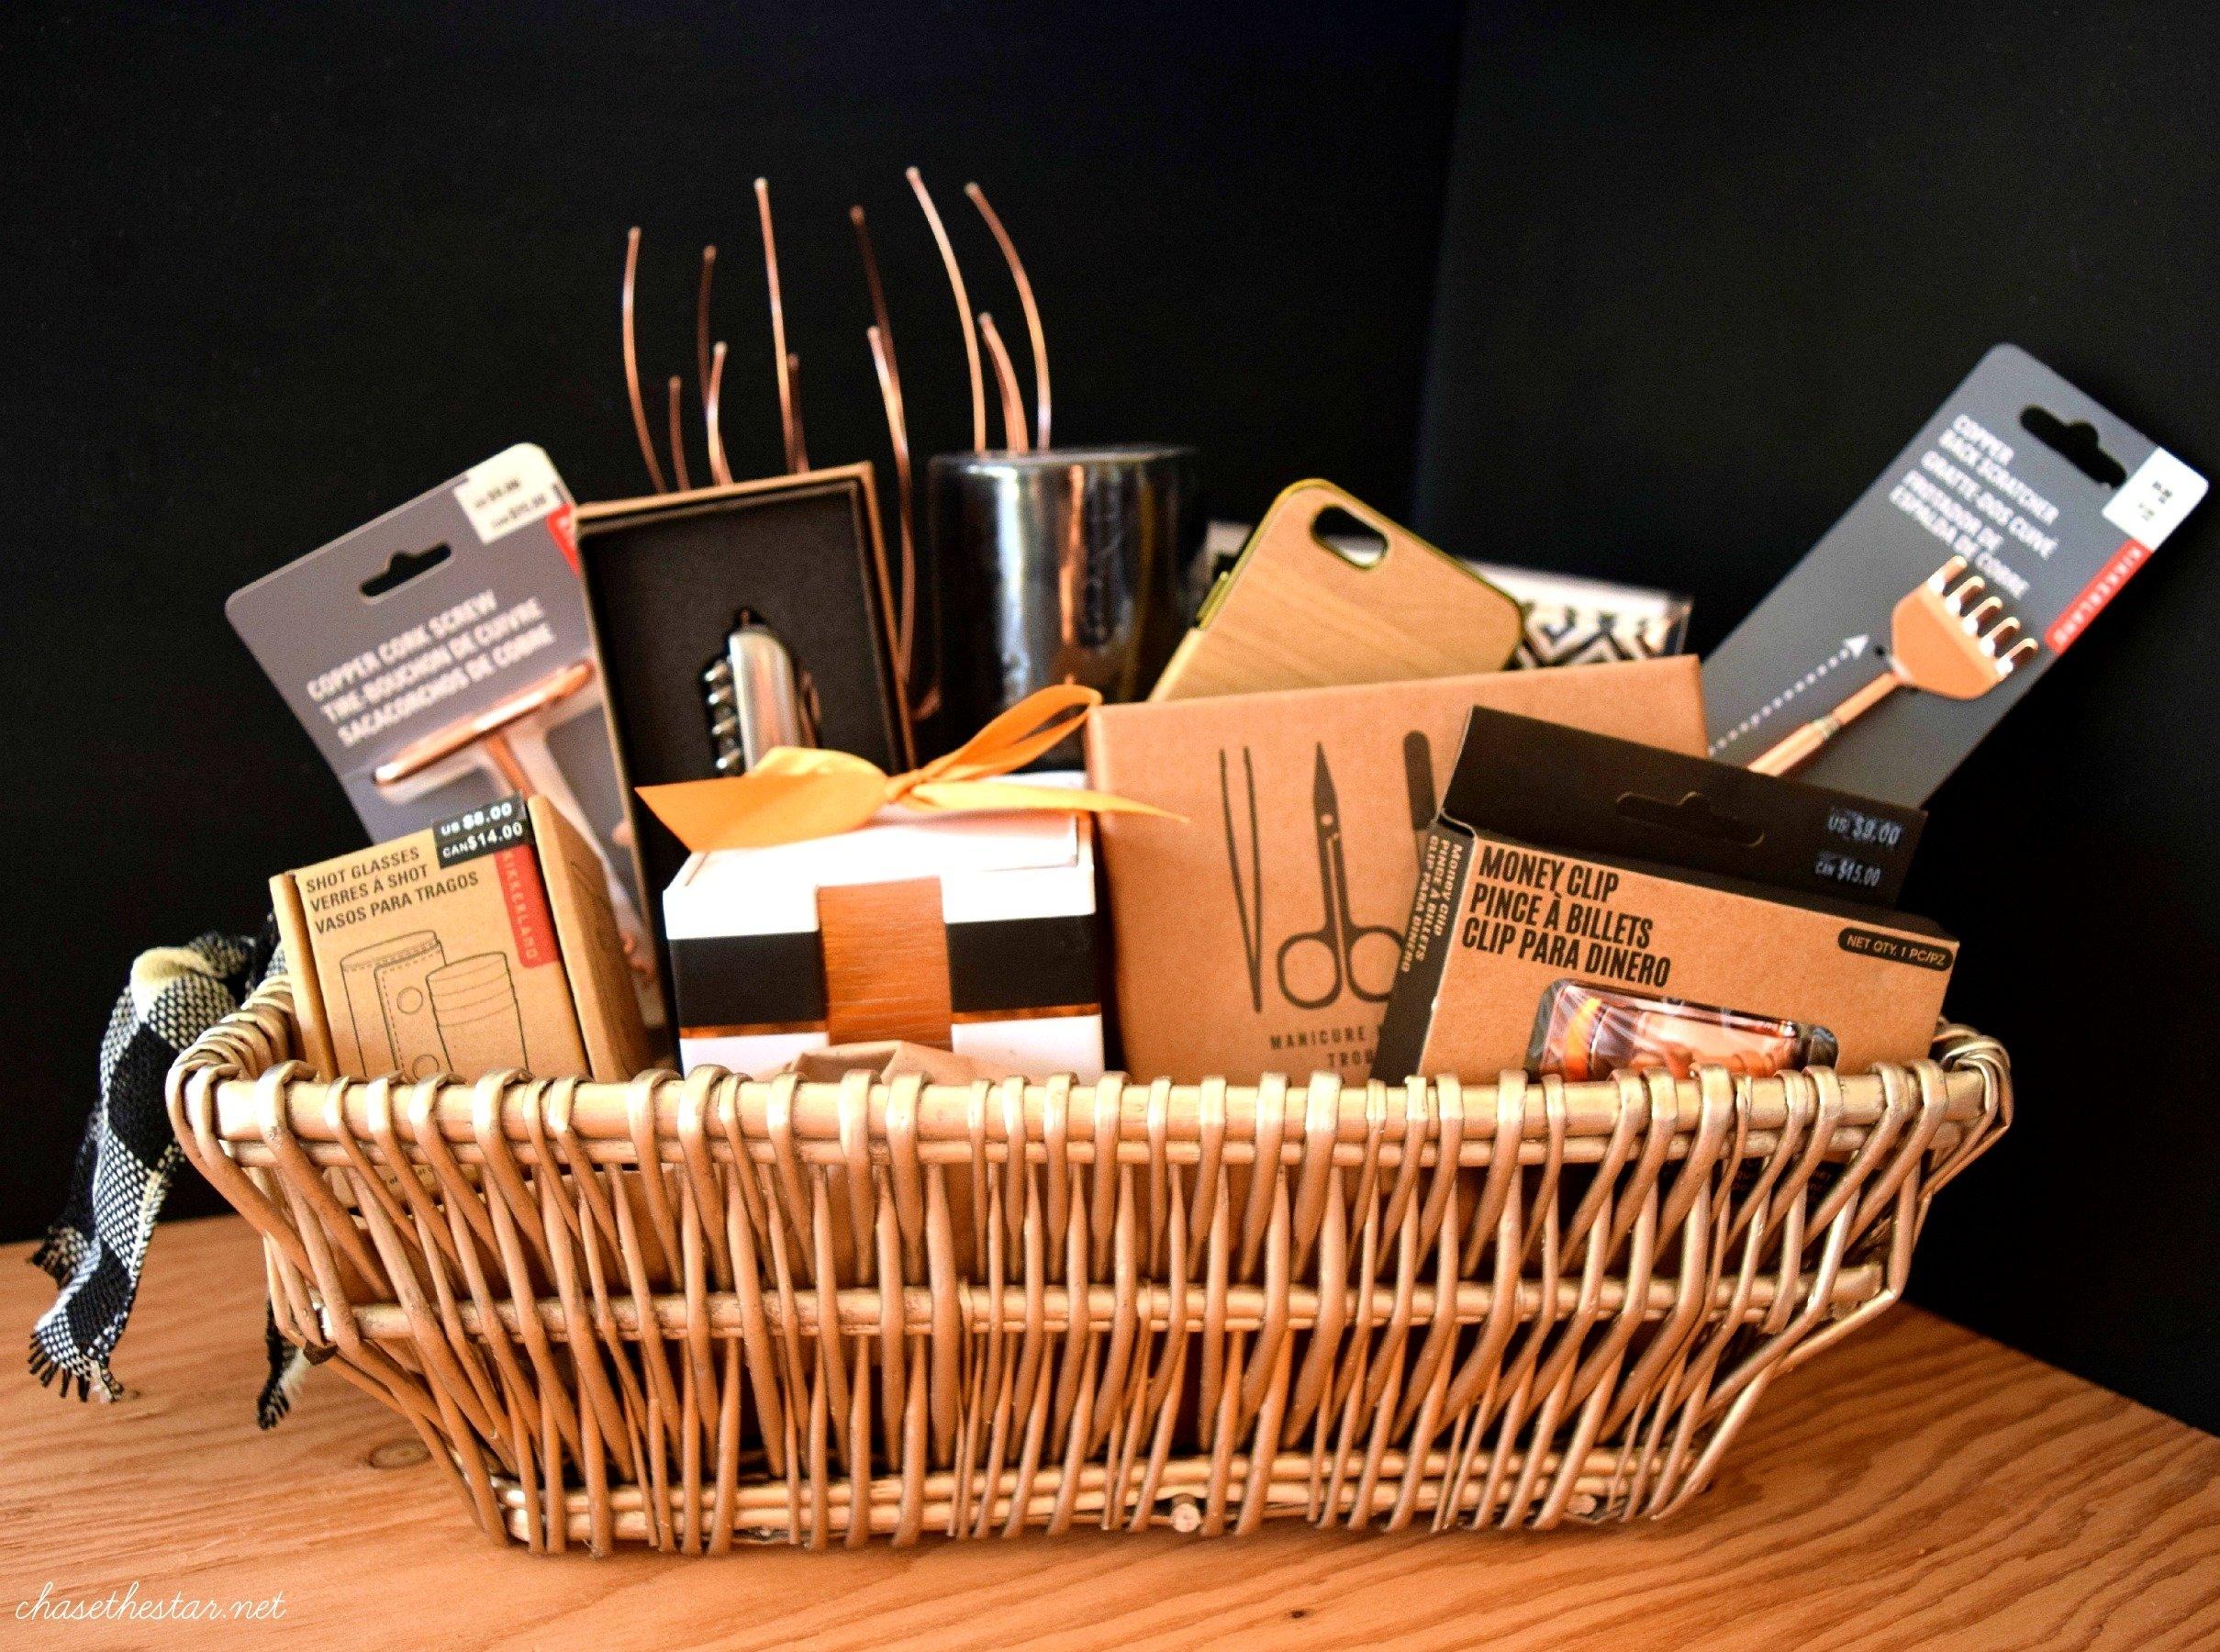 10 Cute Gift Baskets For Men Ideas 3 diy gift basket ideas 1 2020